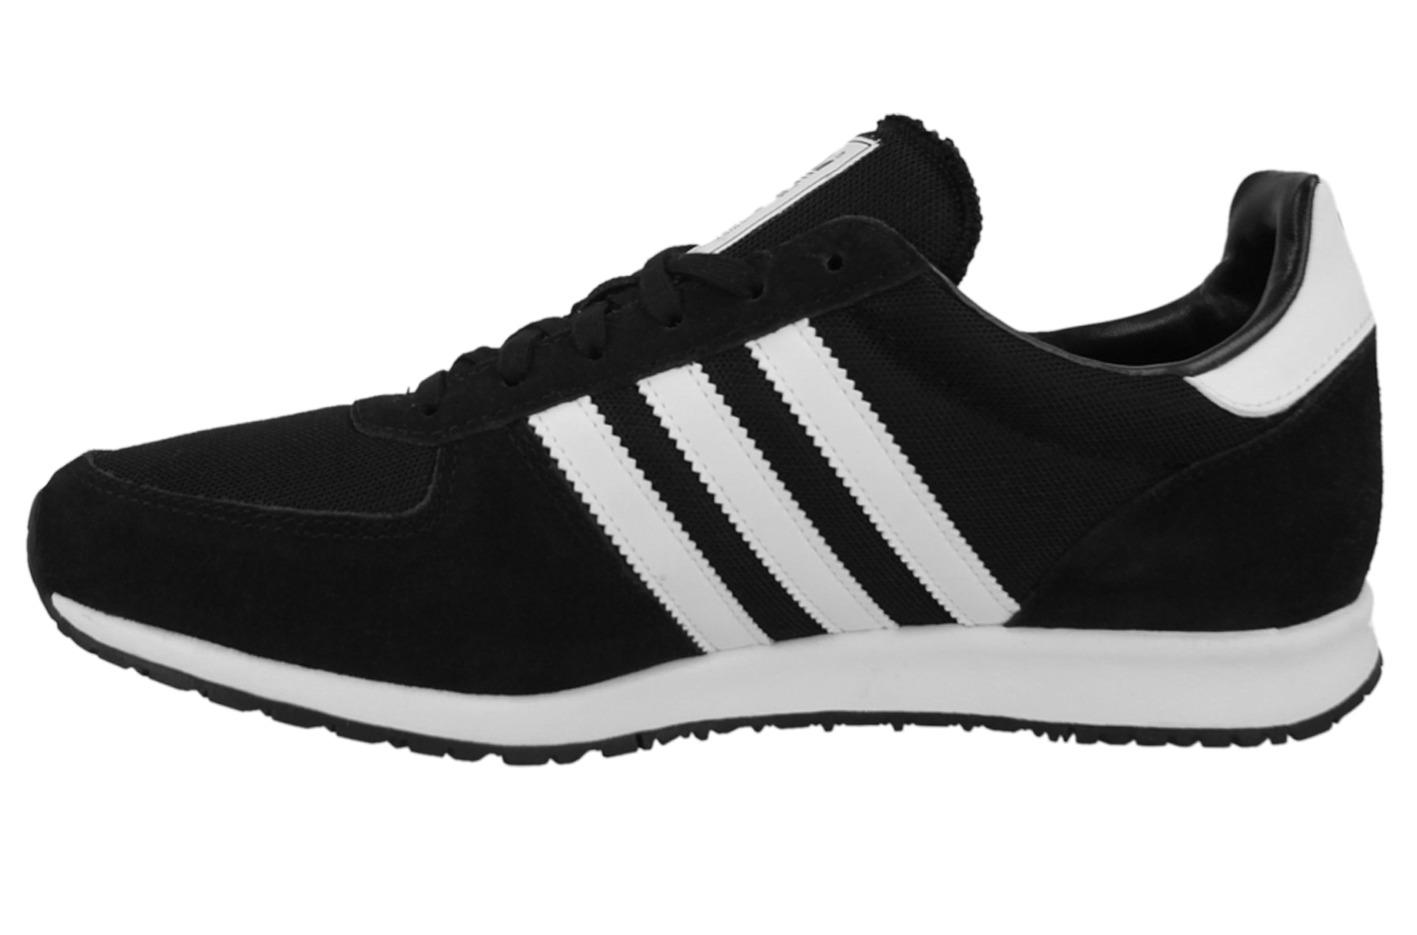 Adidas Adistar Racer